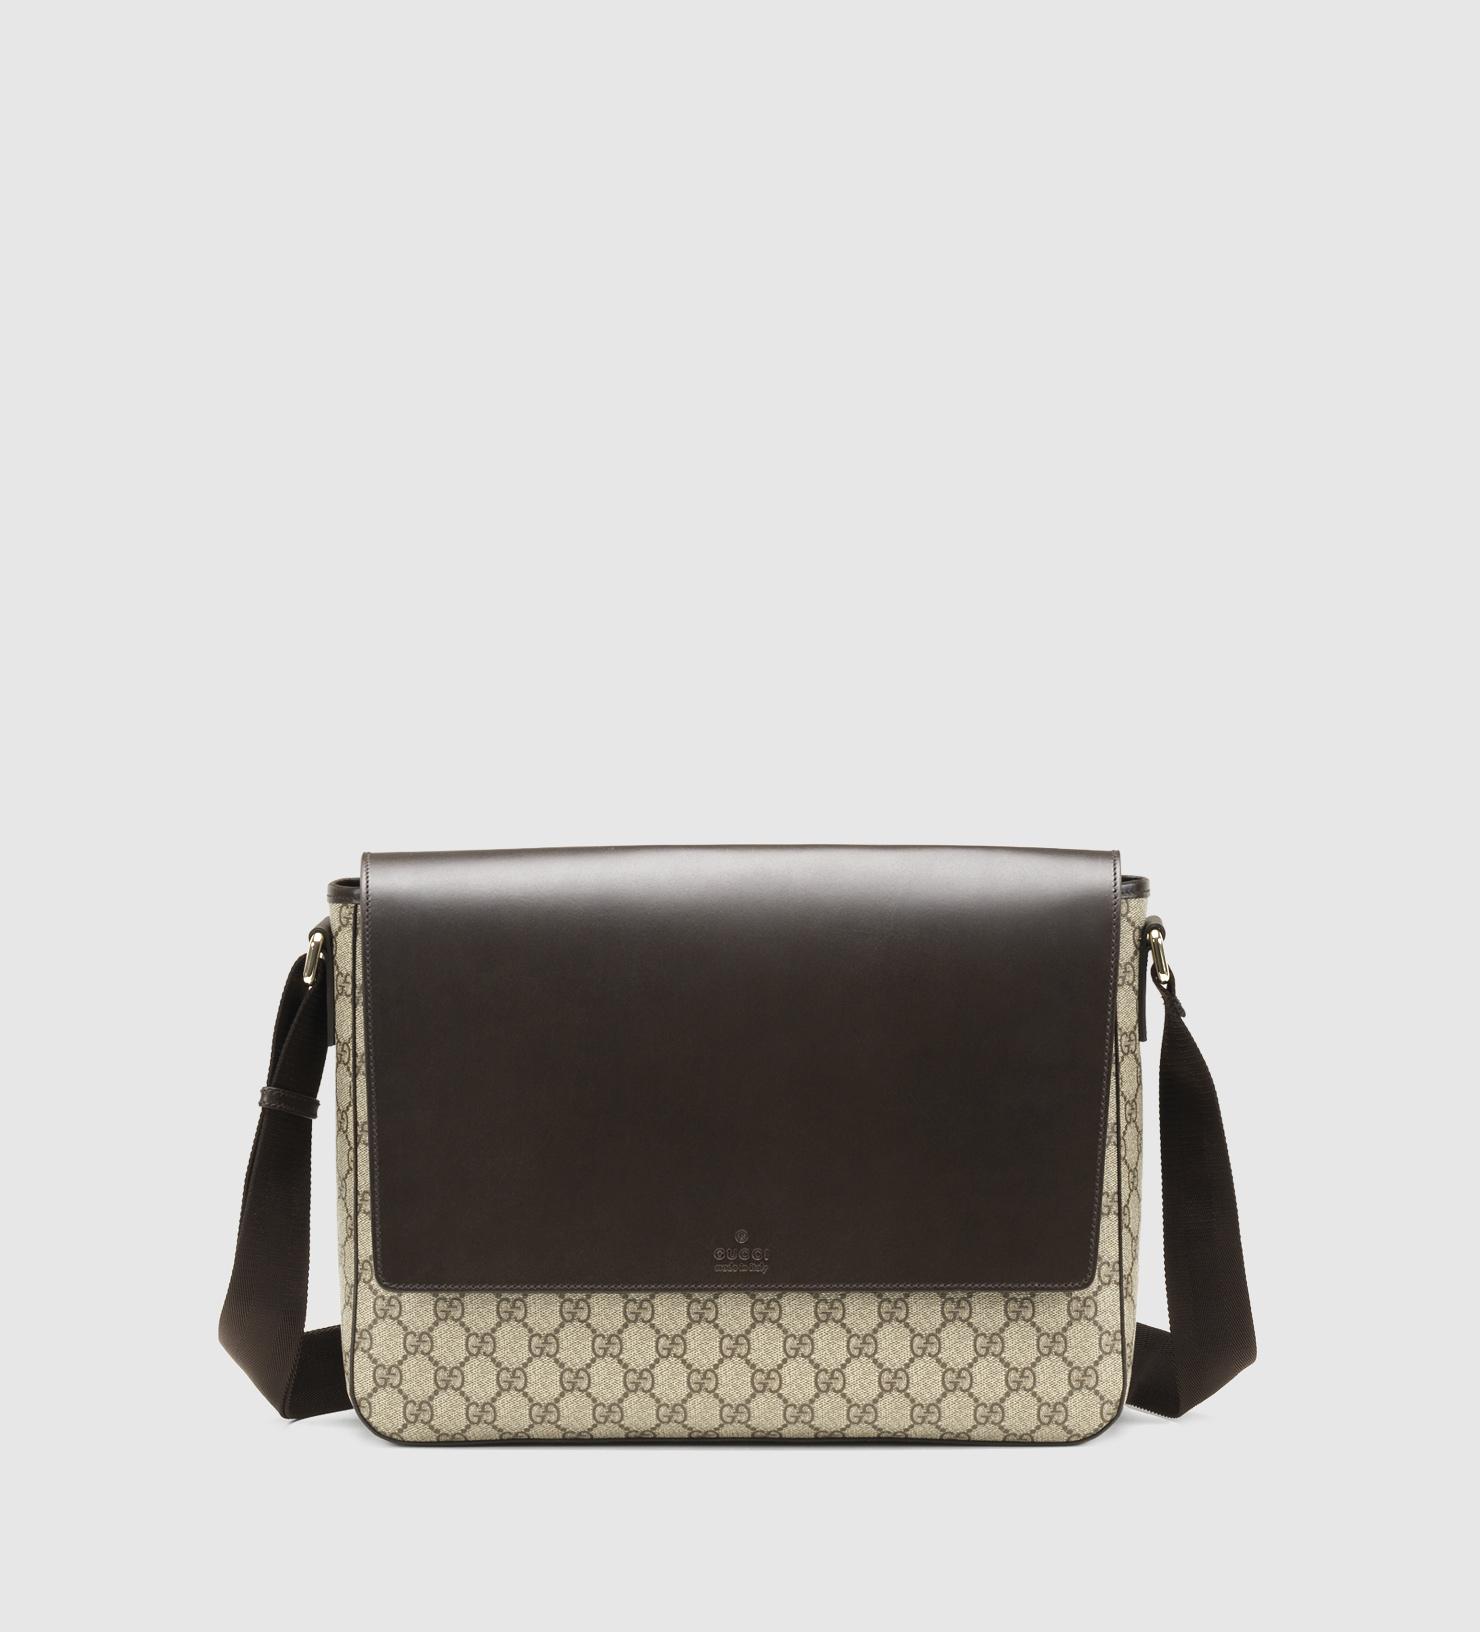 0b694c92fbf2 Gucci Gg Supreme Canvas Messenger Bag in Brown - Lyst